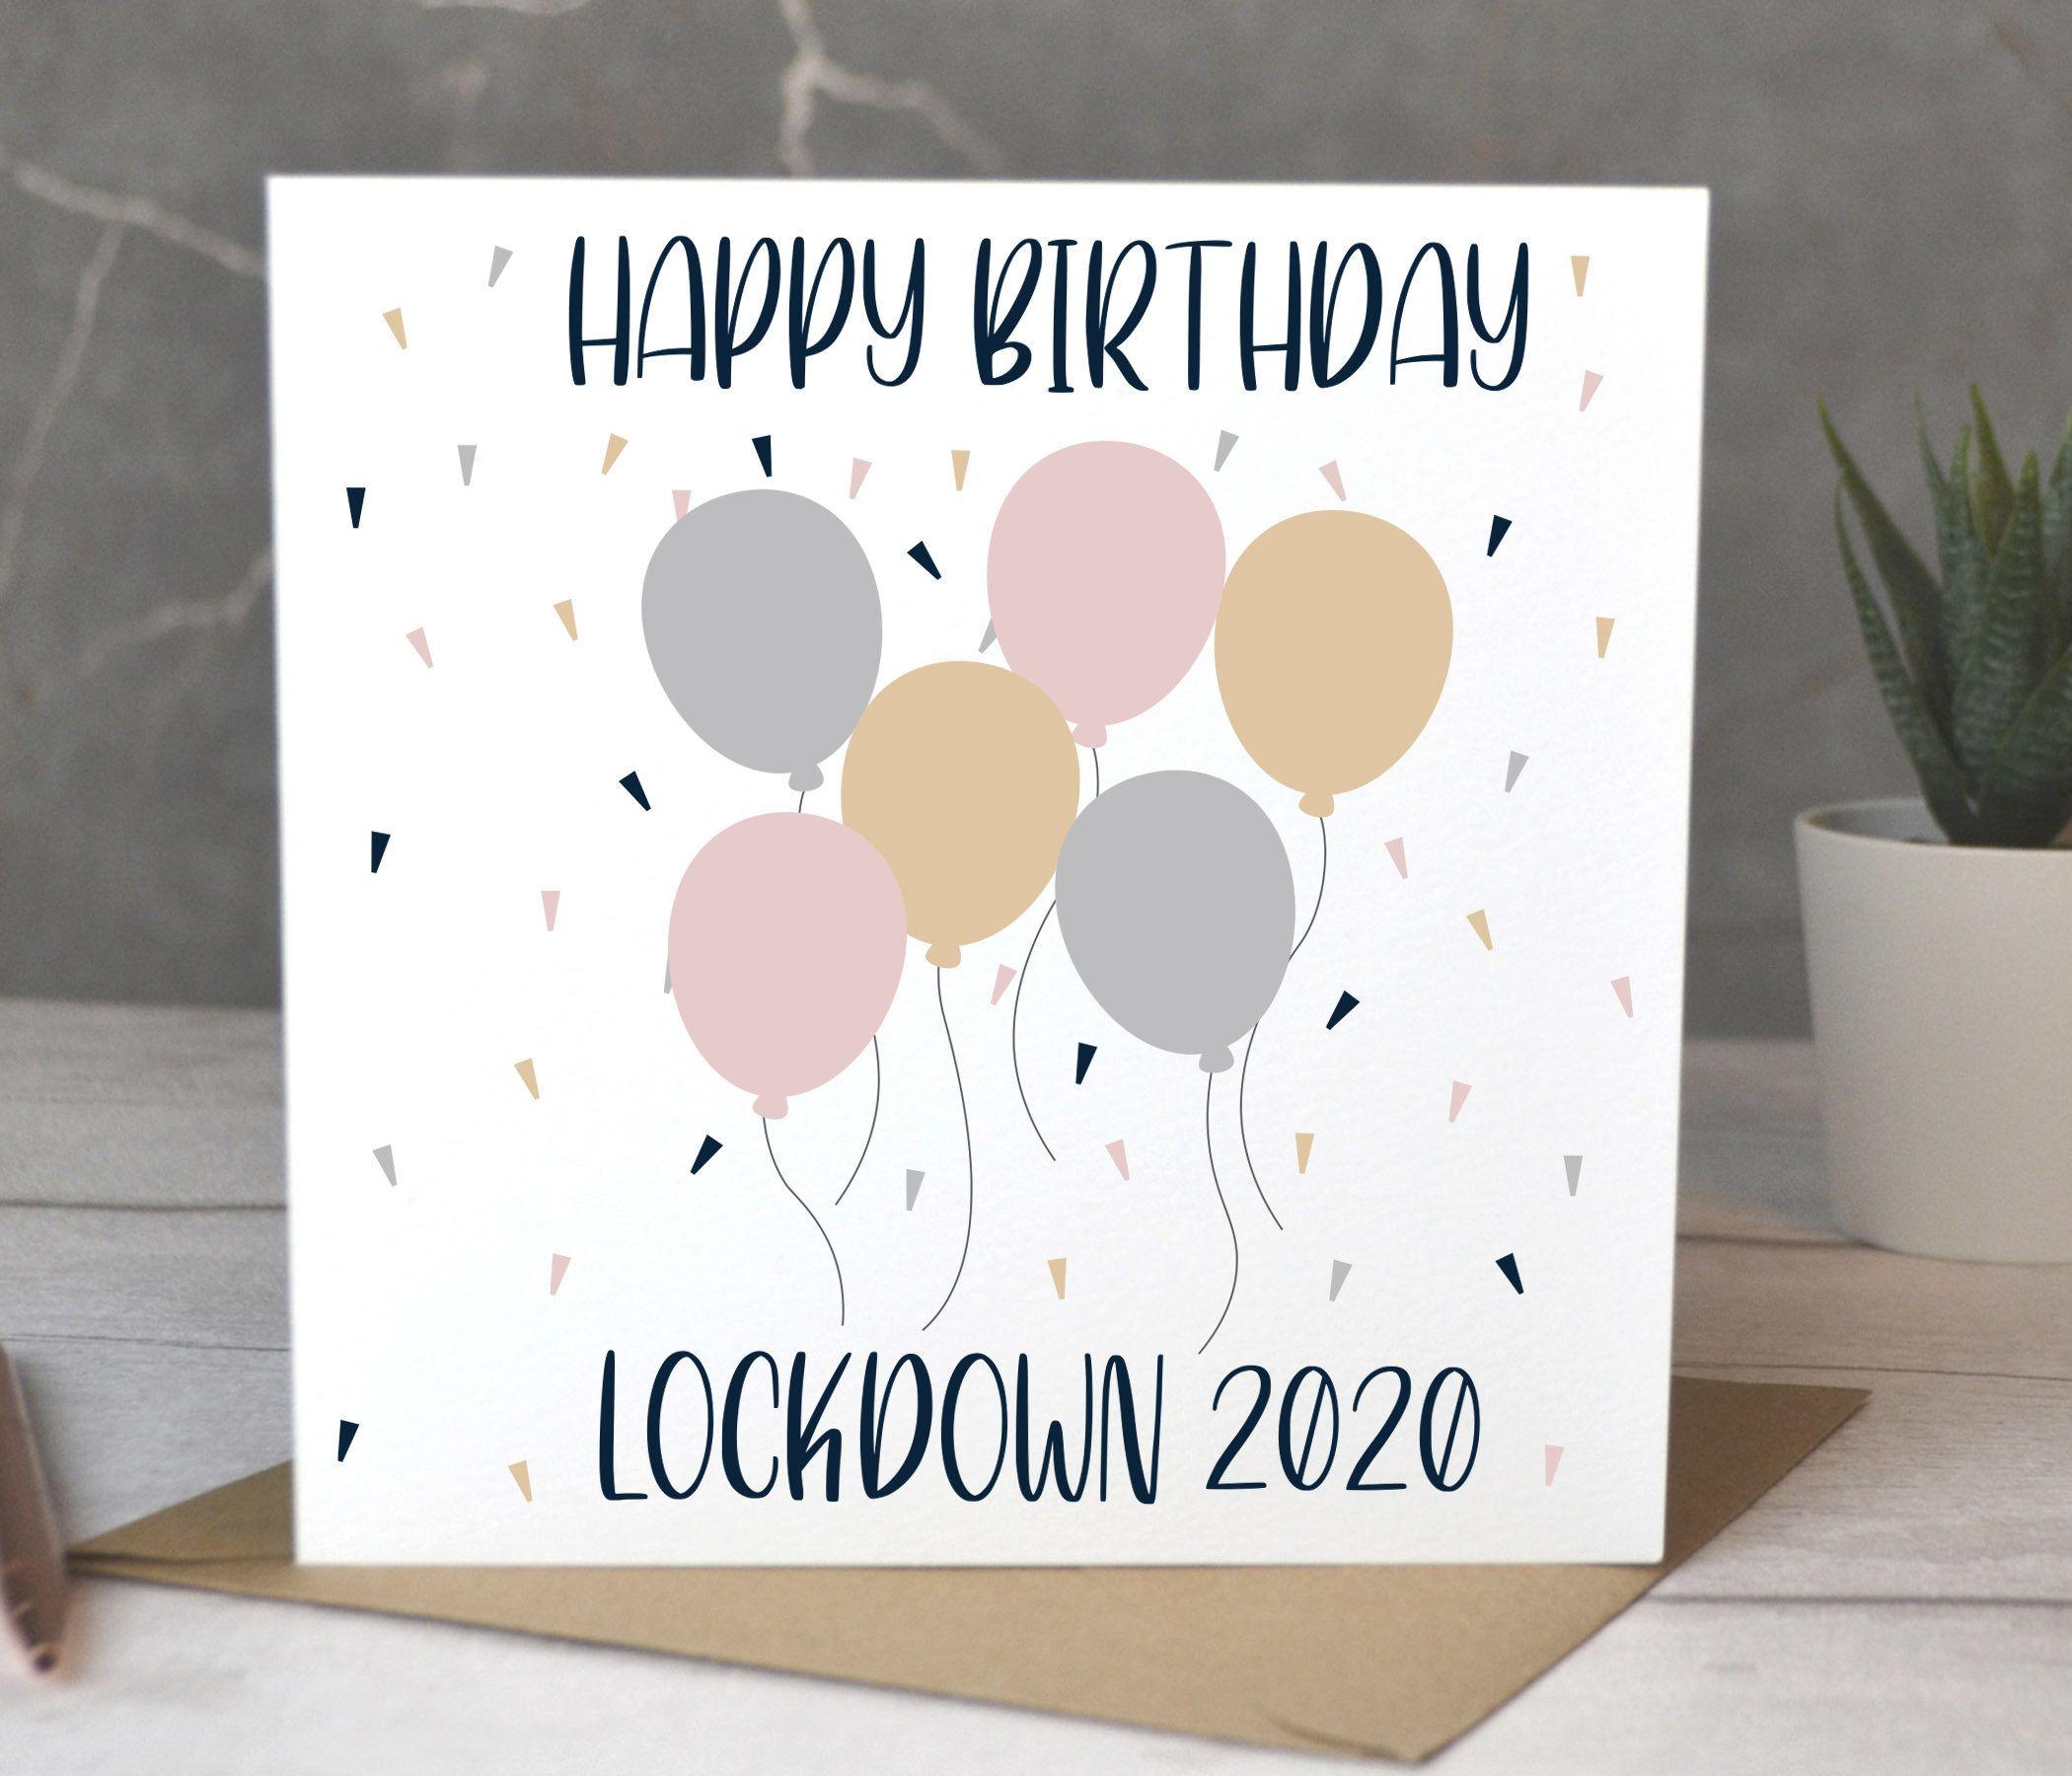 Lockdown Birthday Card, Birthday Card, Birthday Balloons